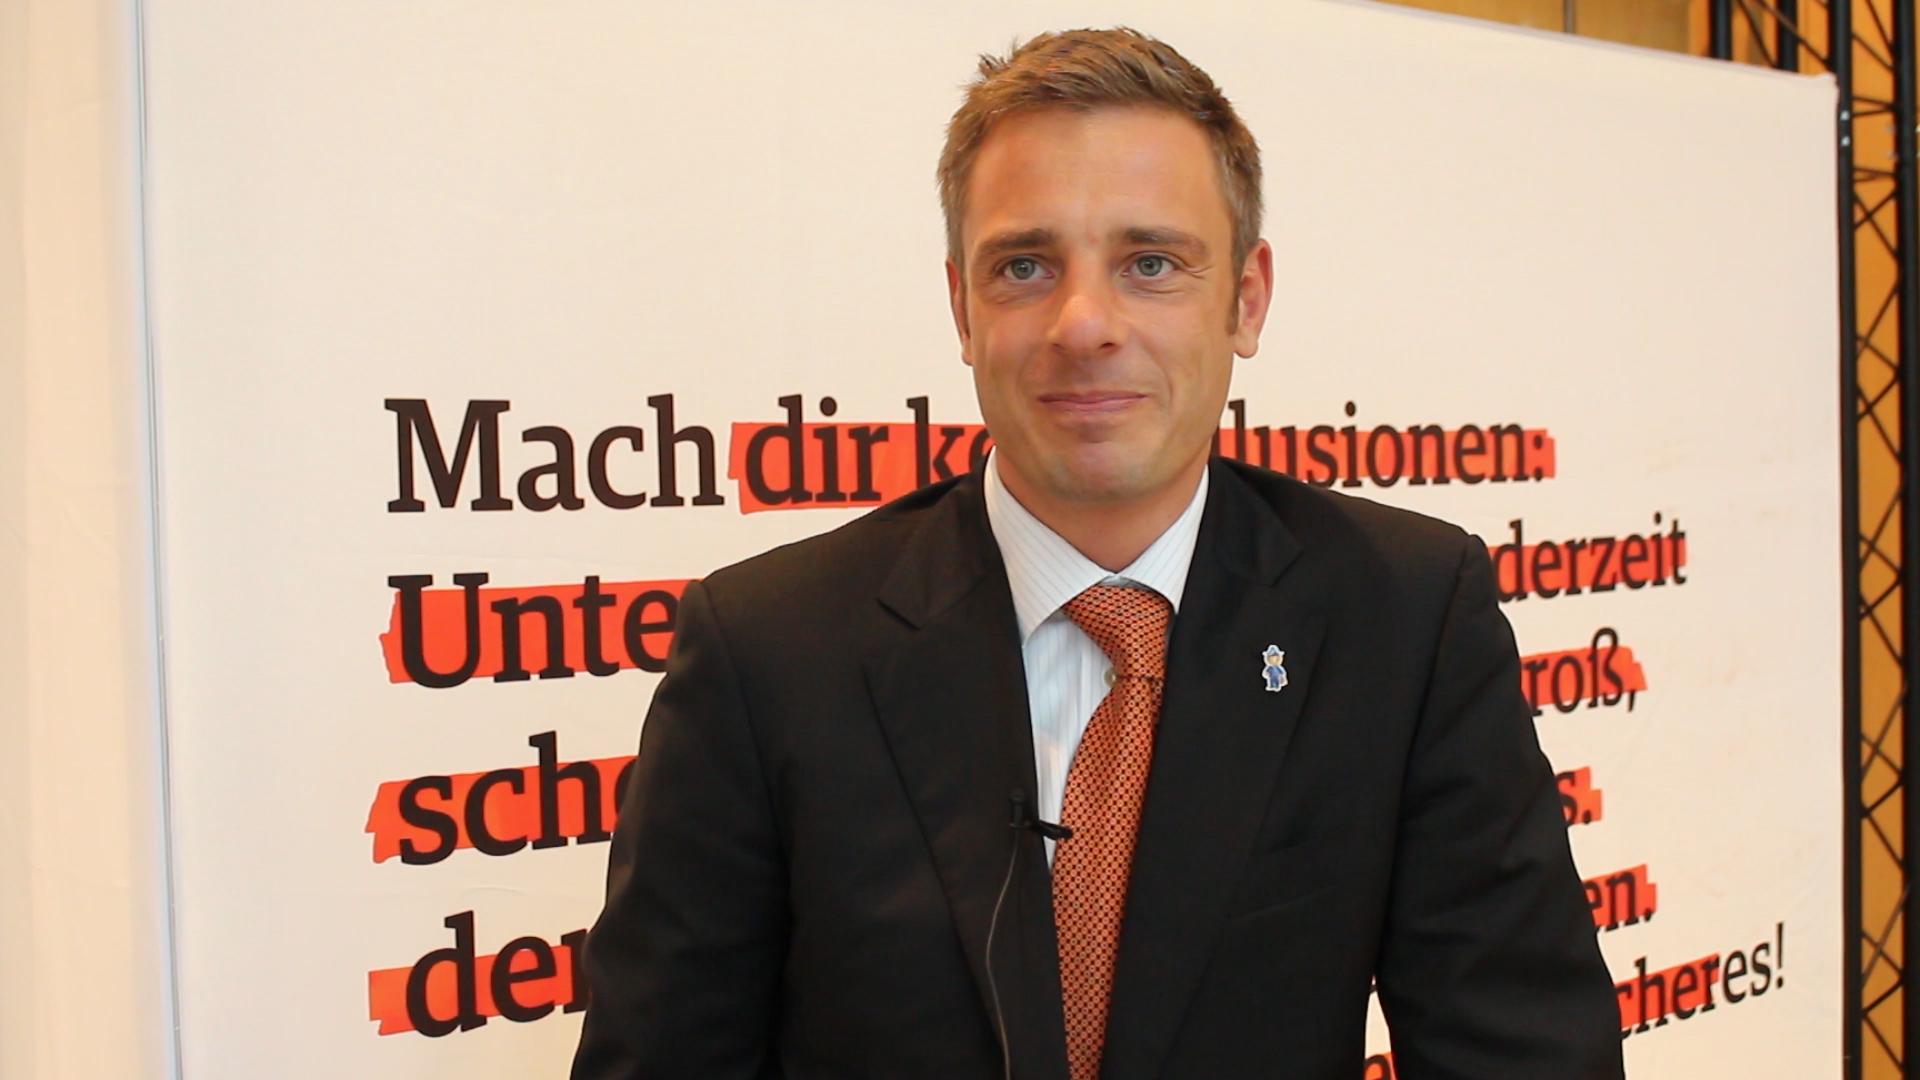 Alexander Lohse